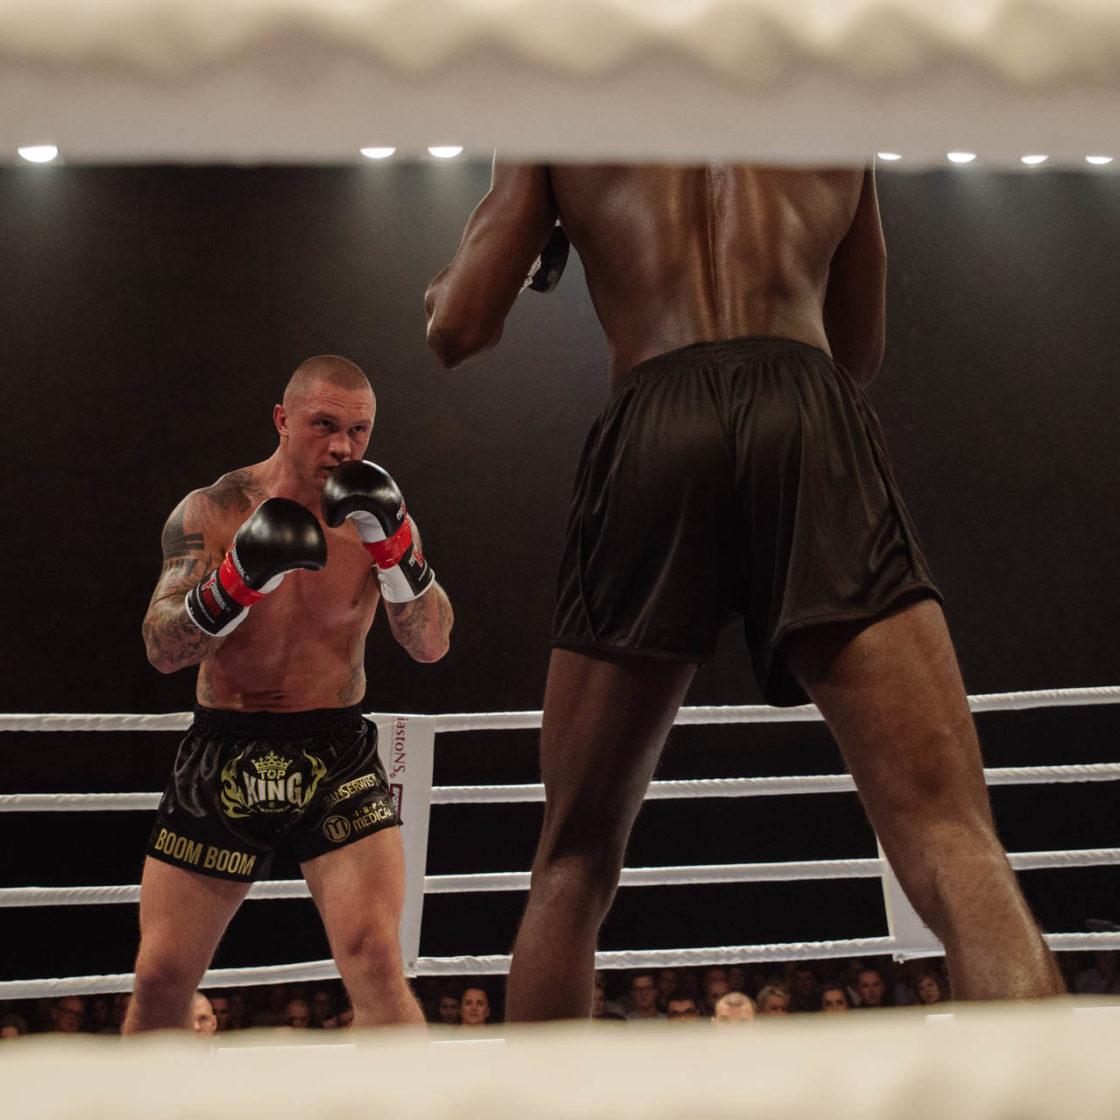 plawecki_lukasz_vs_yankuba_yuwara_hf04_IMG_4762